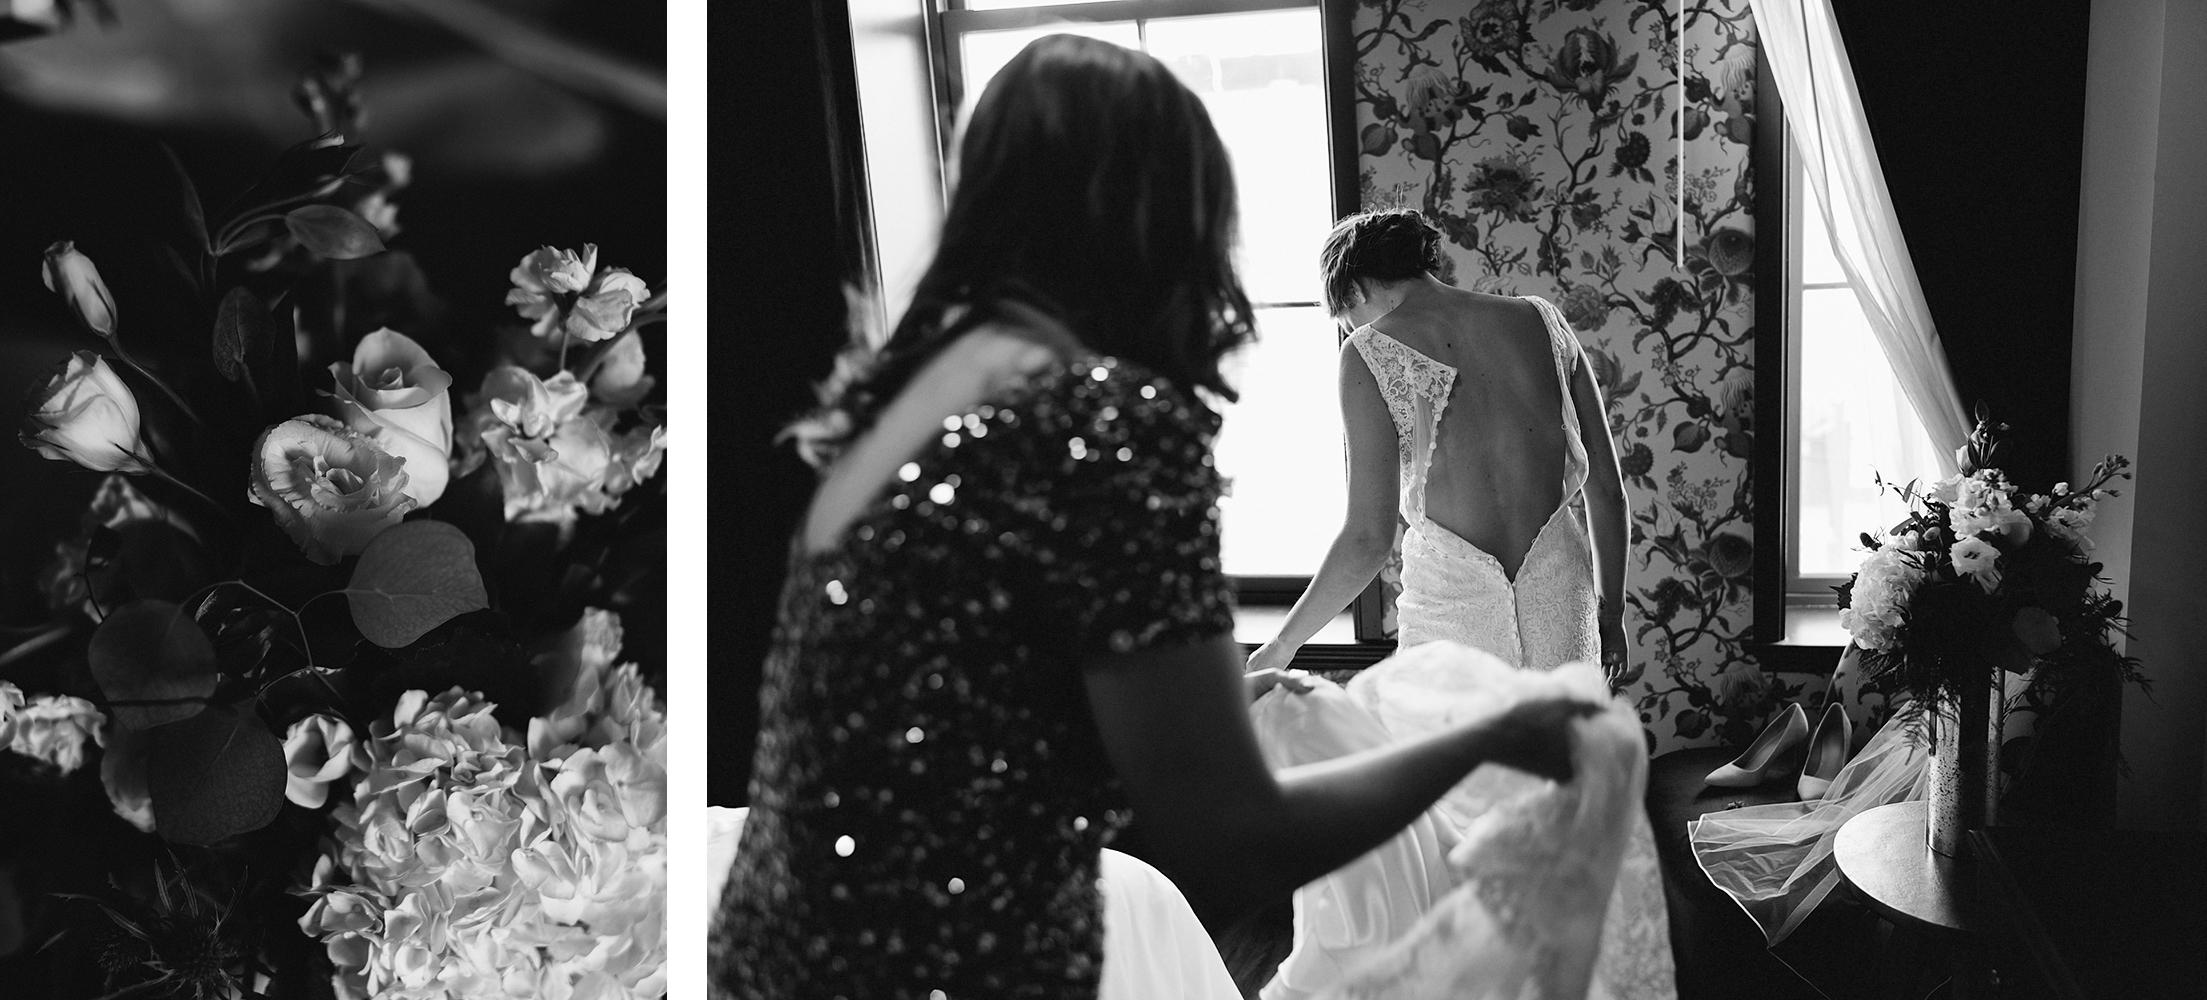 broadview-hotel-REAL-wedding-photos-best-wedding-venues-toronto-analog-film-wedding-photography-boutique-hotel-19.jpg